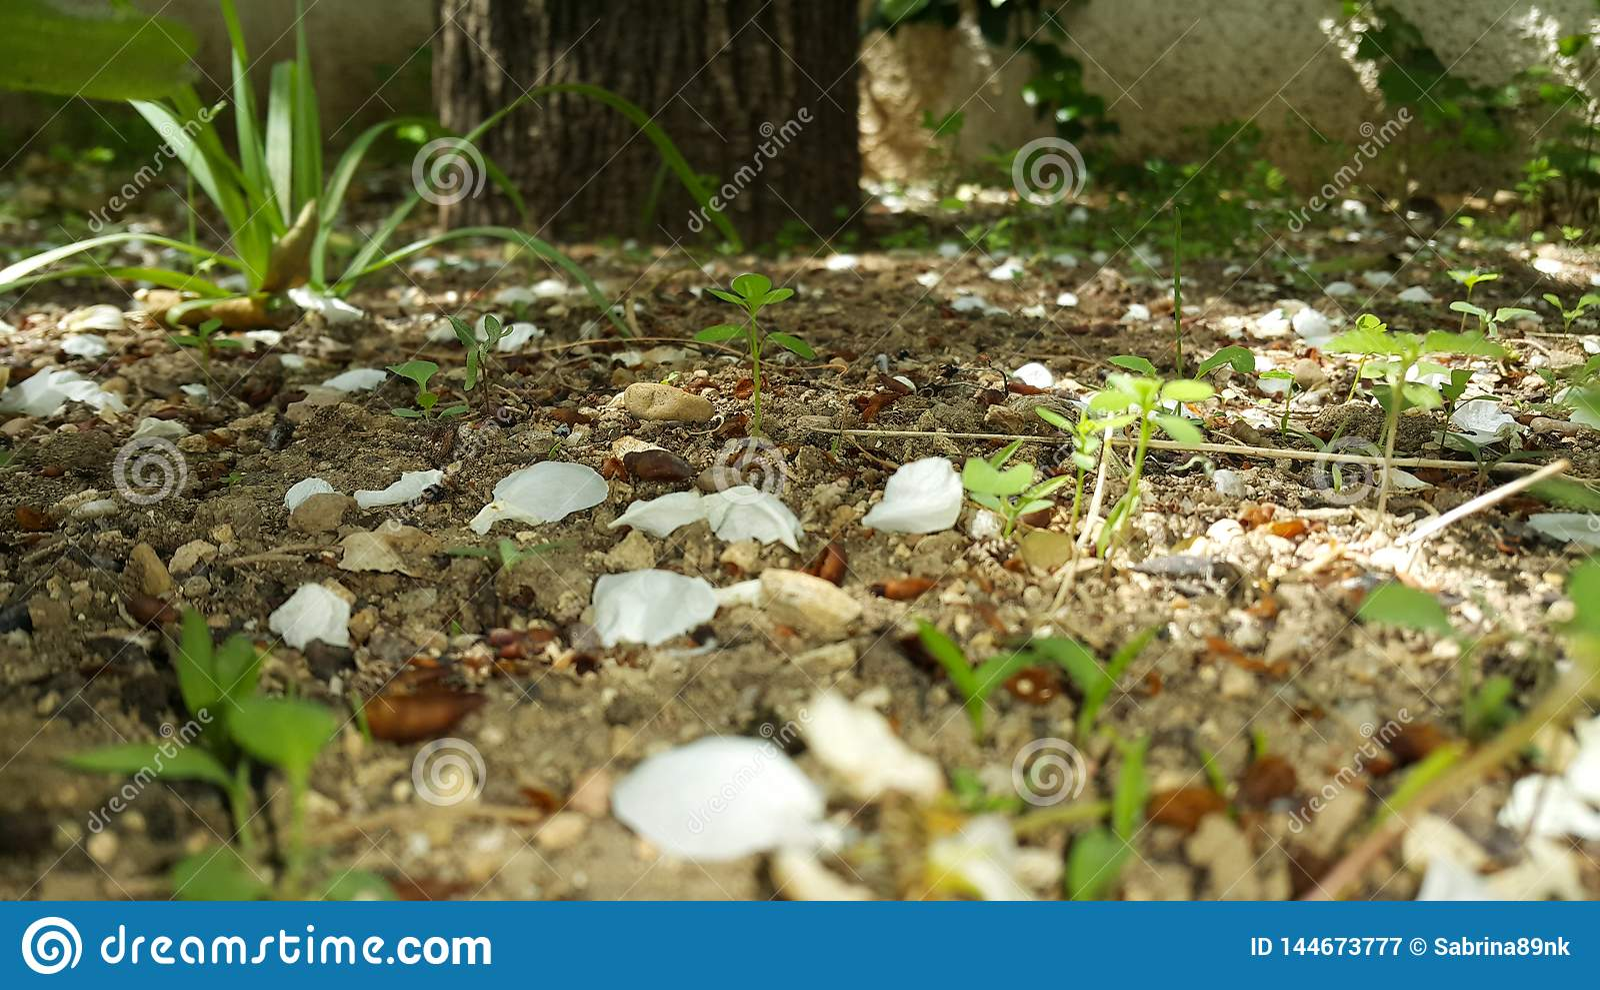 Plant soil forest